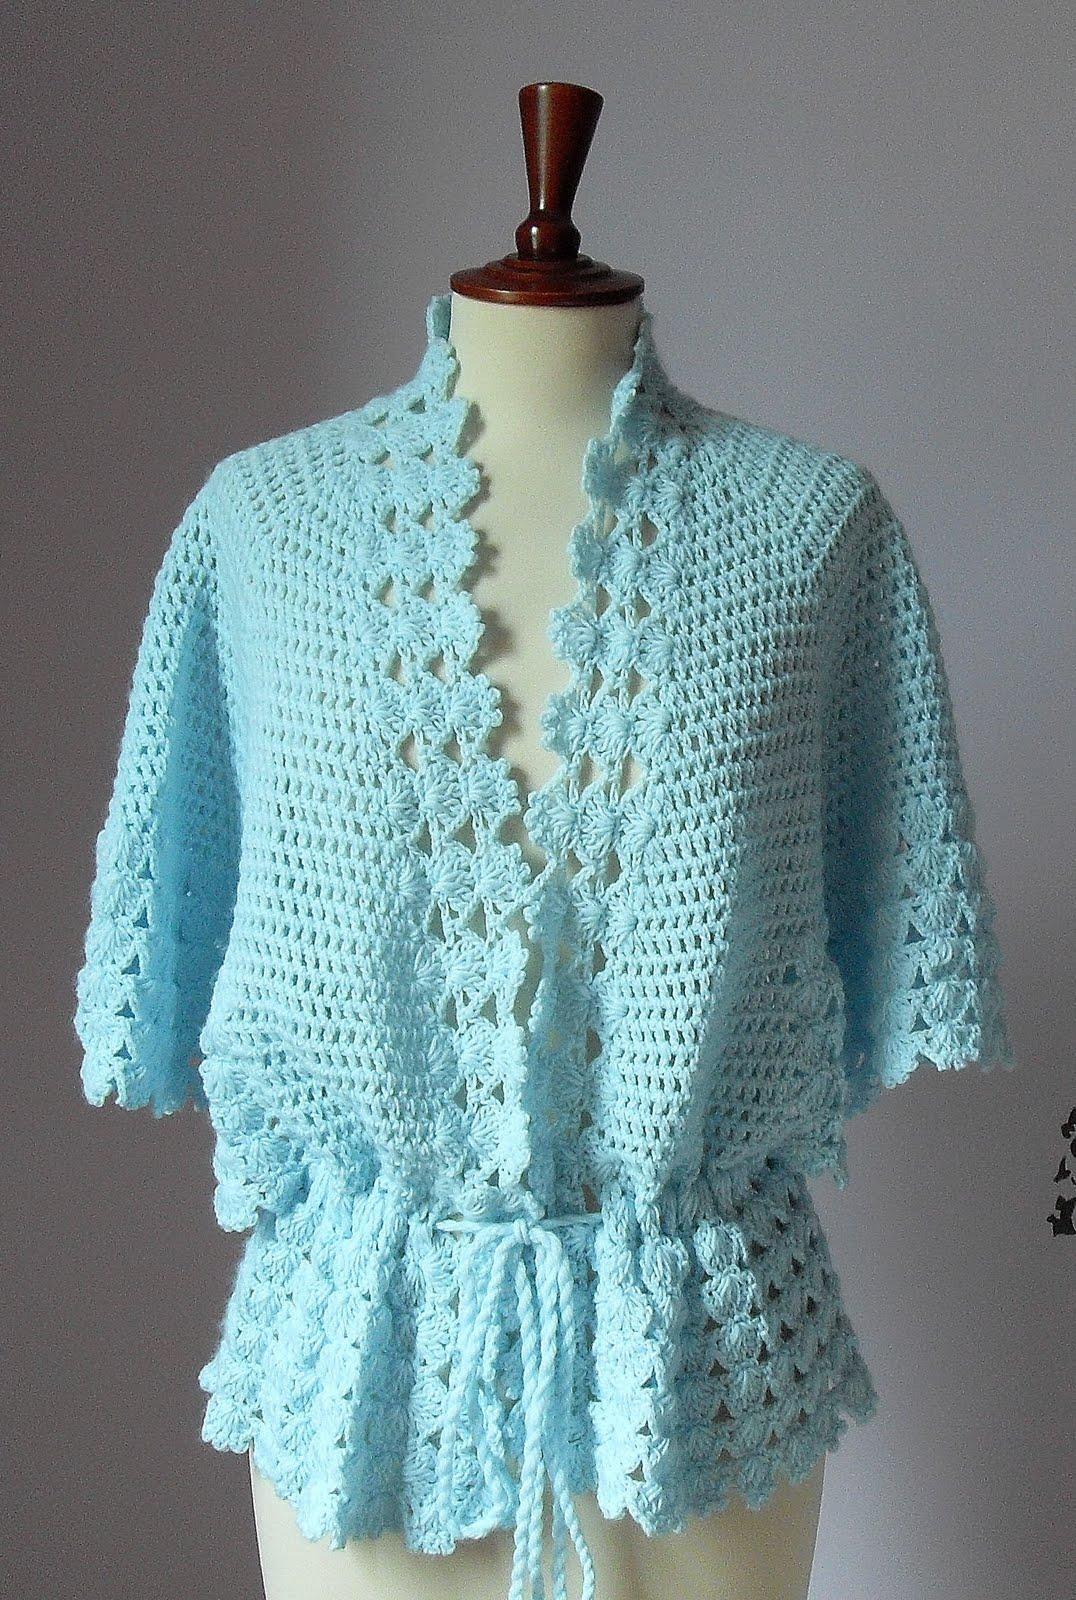 Crocheted Jacket Patterns - Crochet and Knitting Patterns